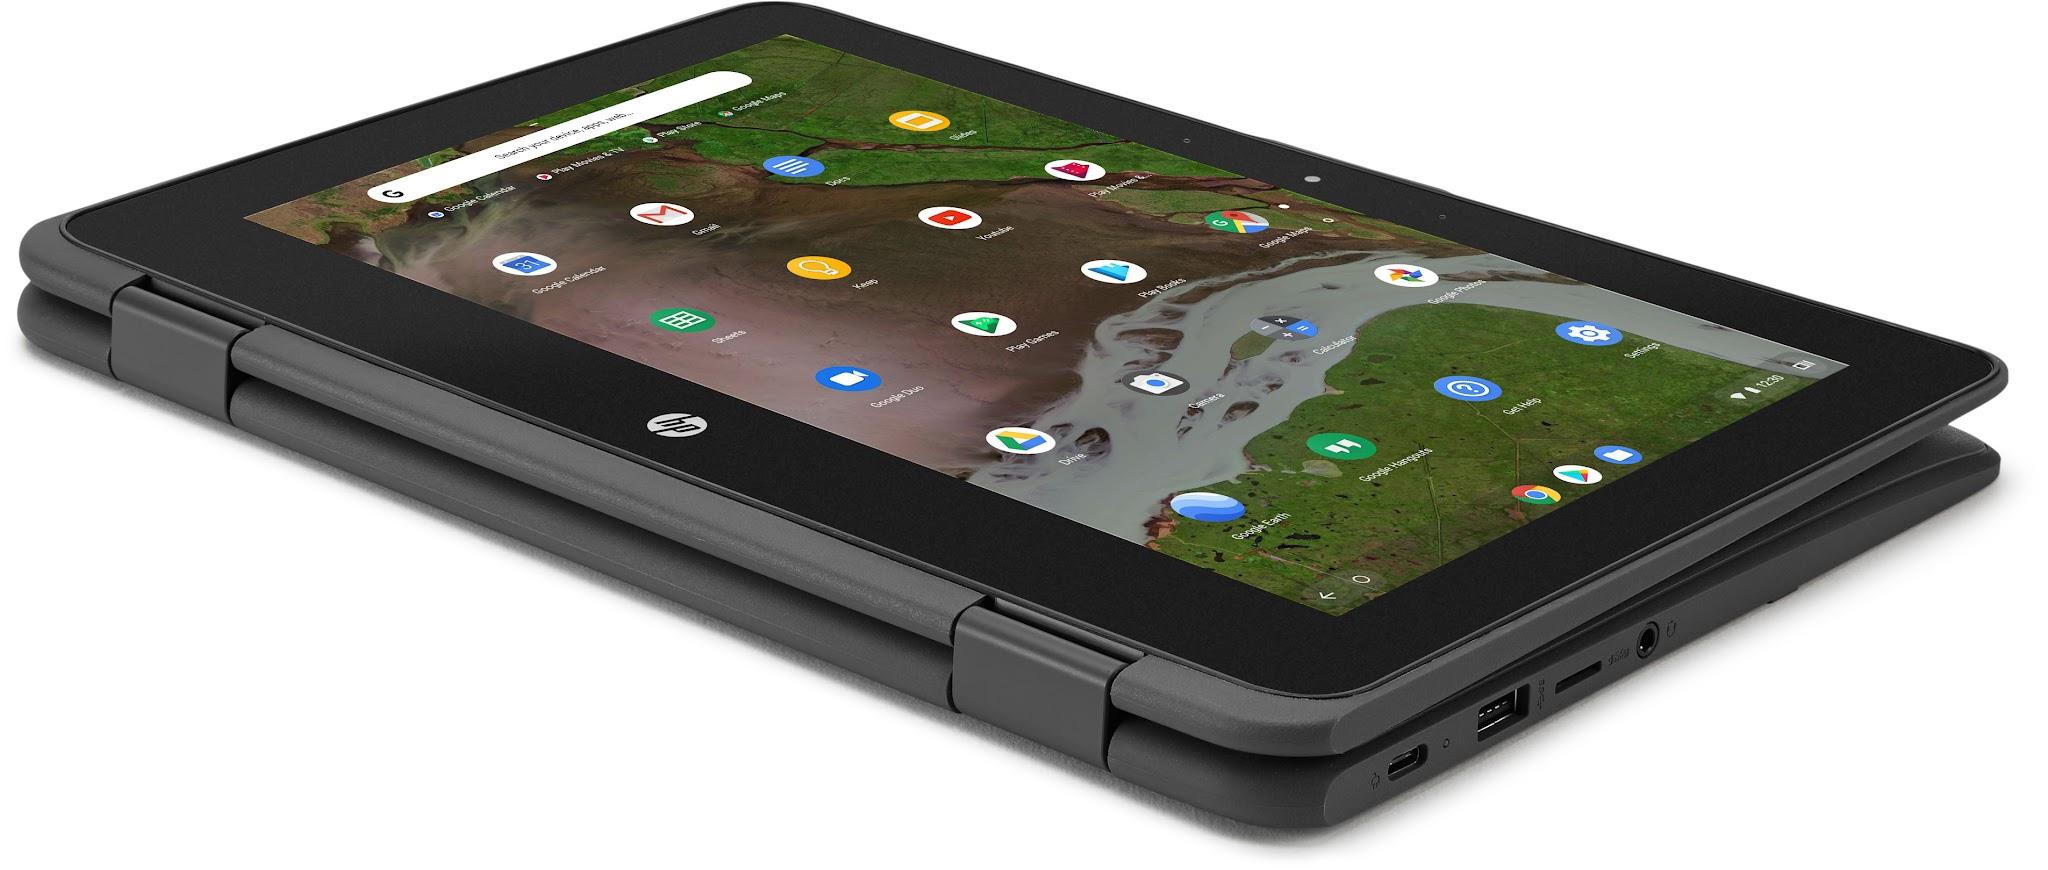 HP Chromebook x360 11 G1 - photo 6